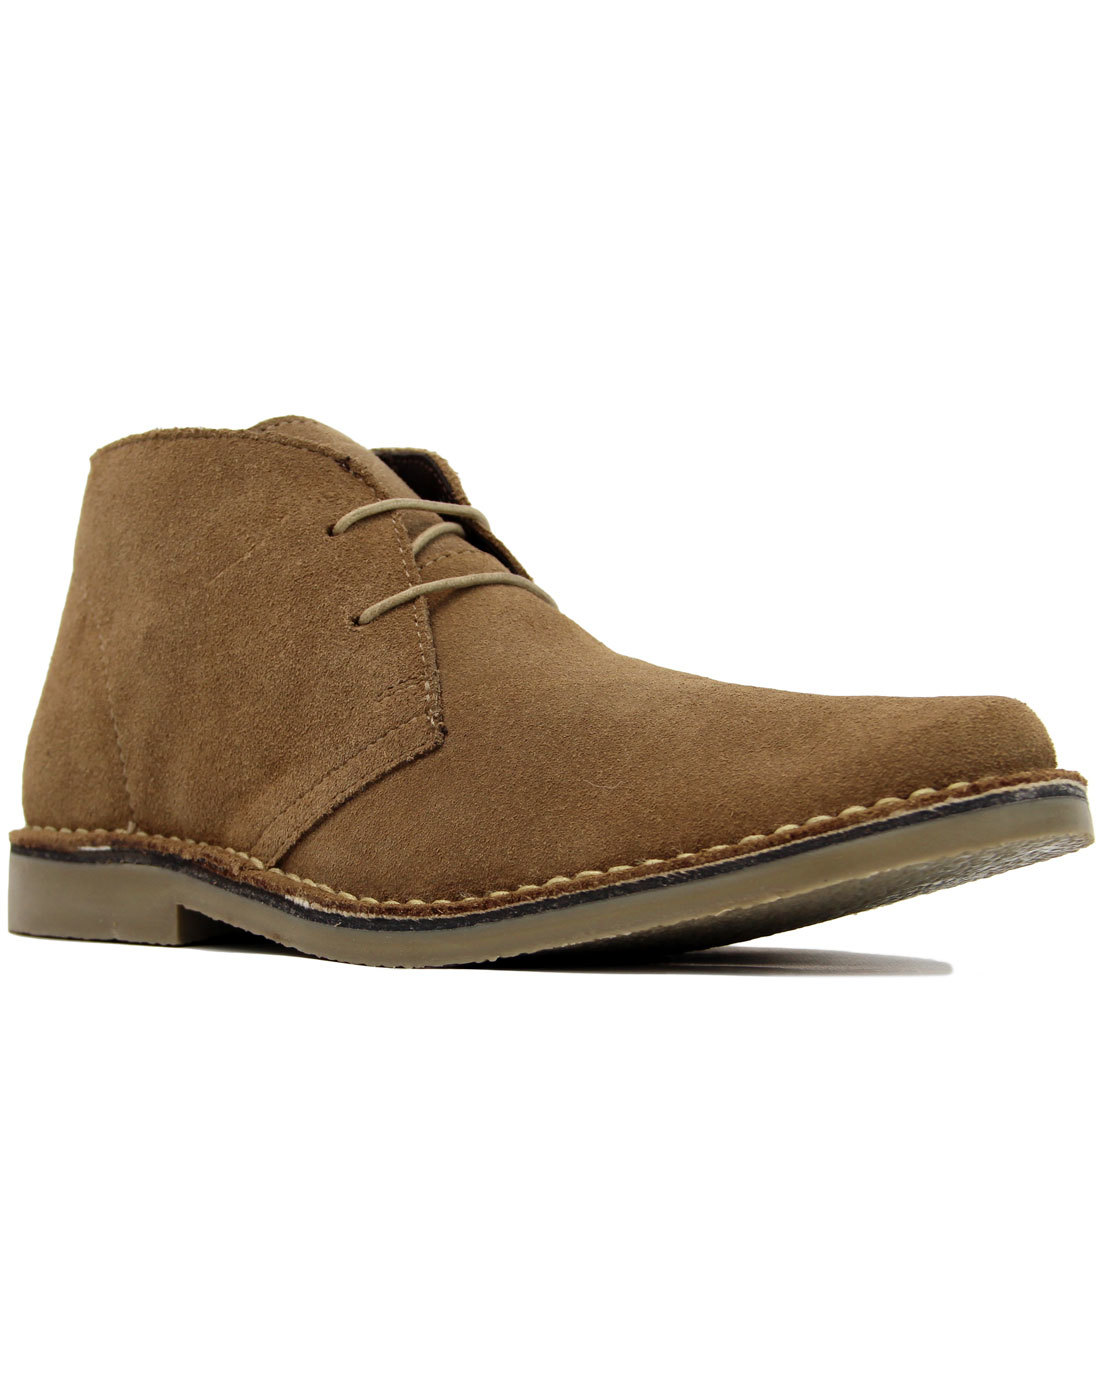 Double Dekker - Mens Mod Suede Desert Boots SAND